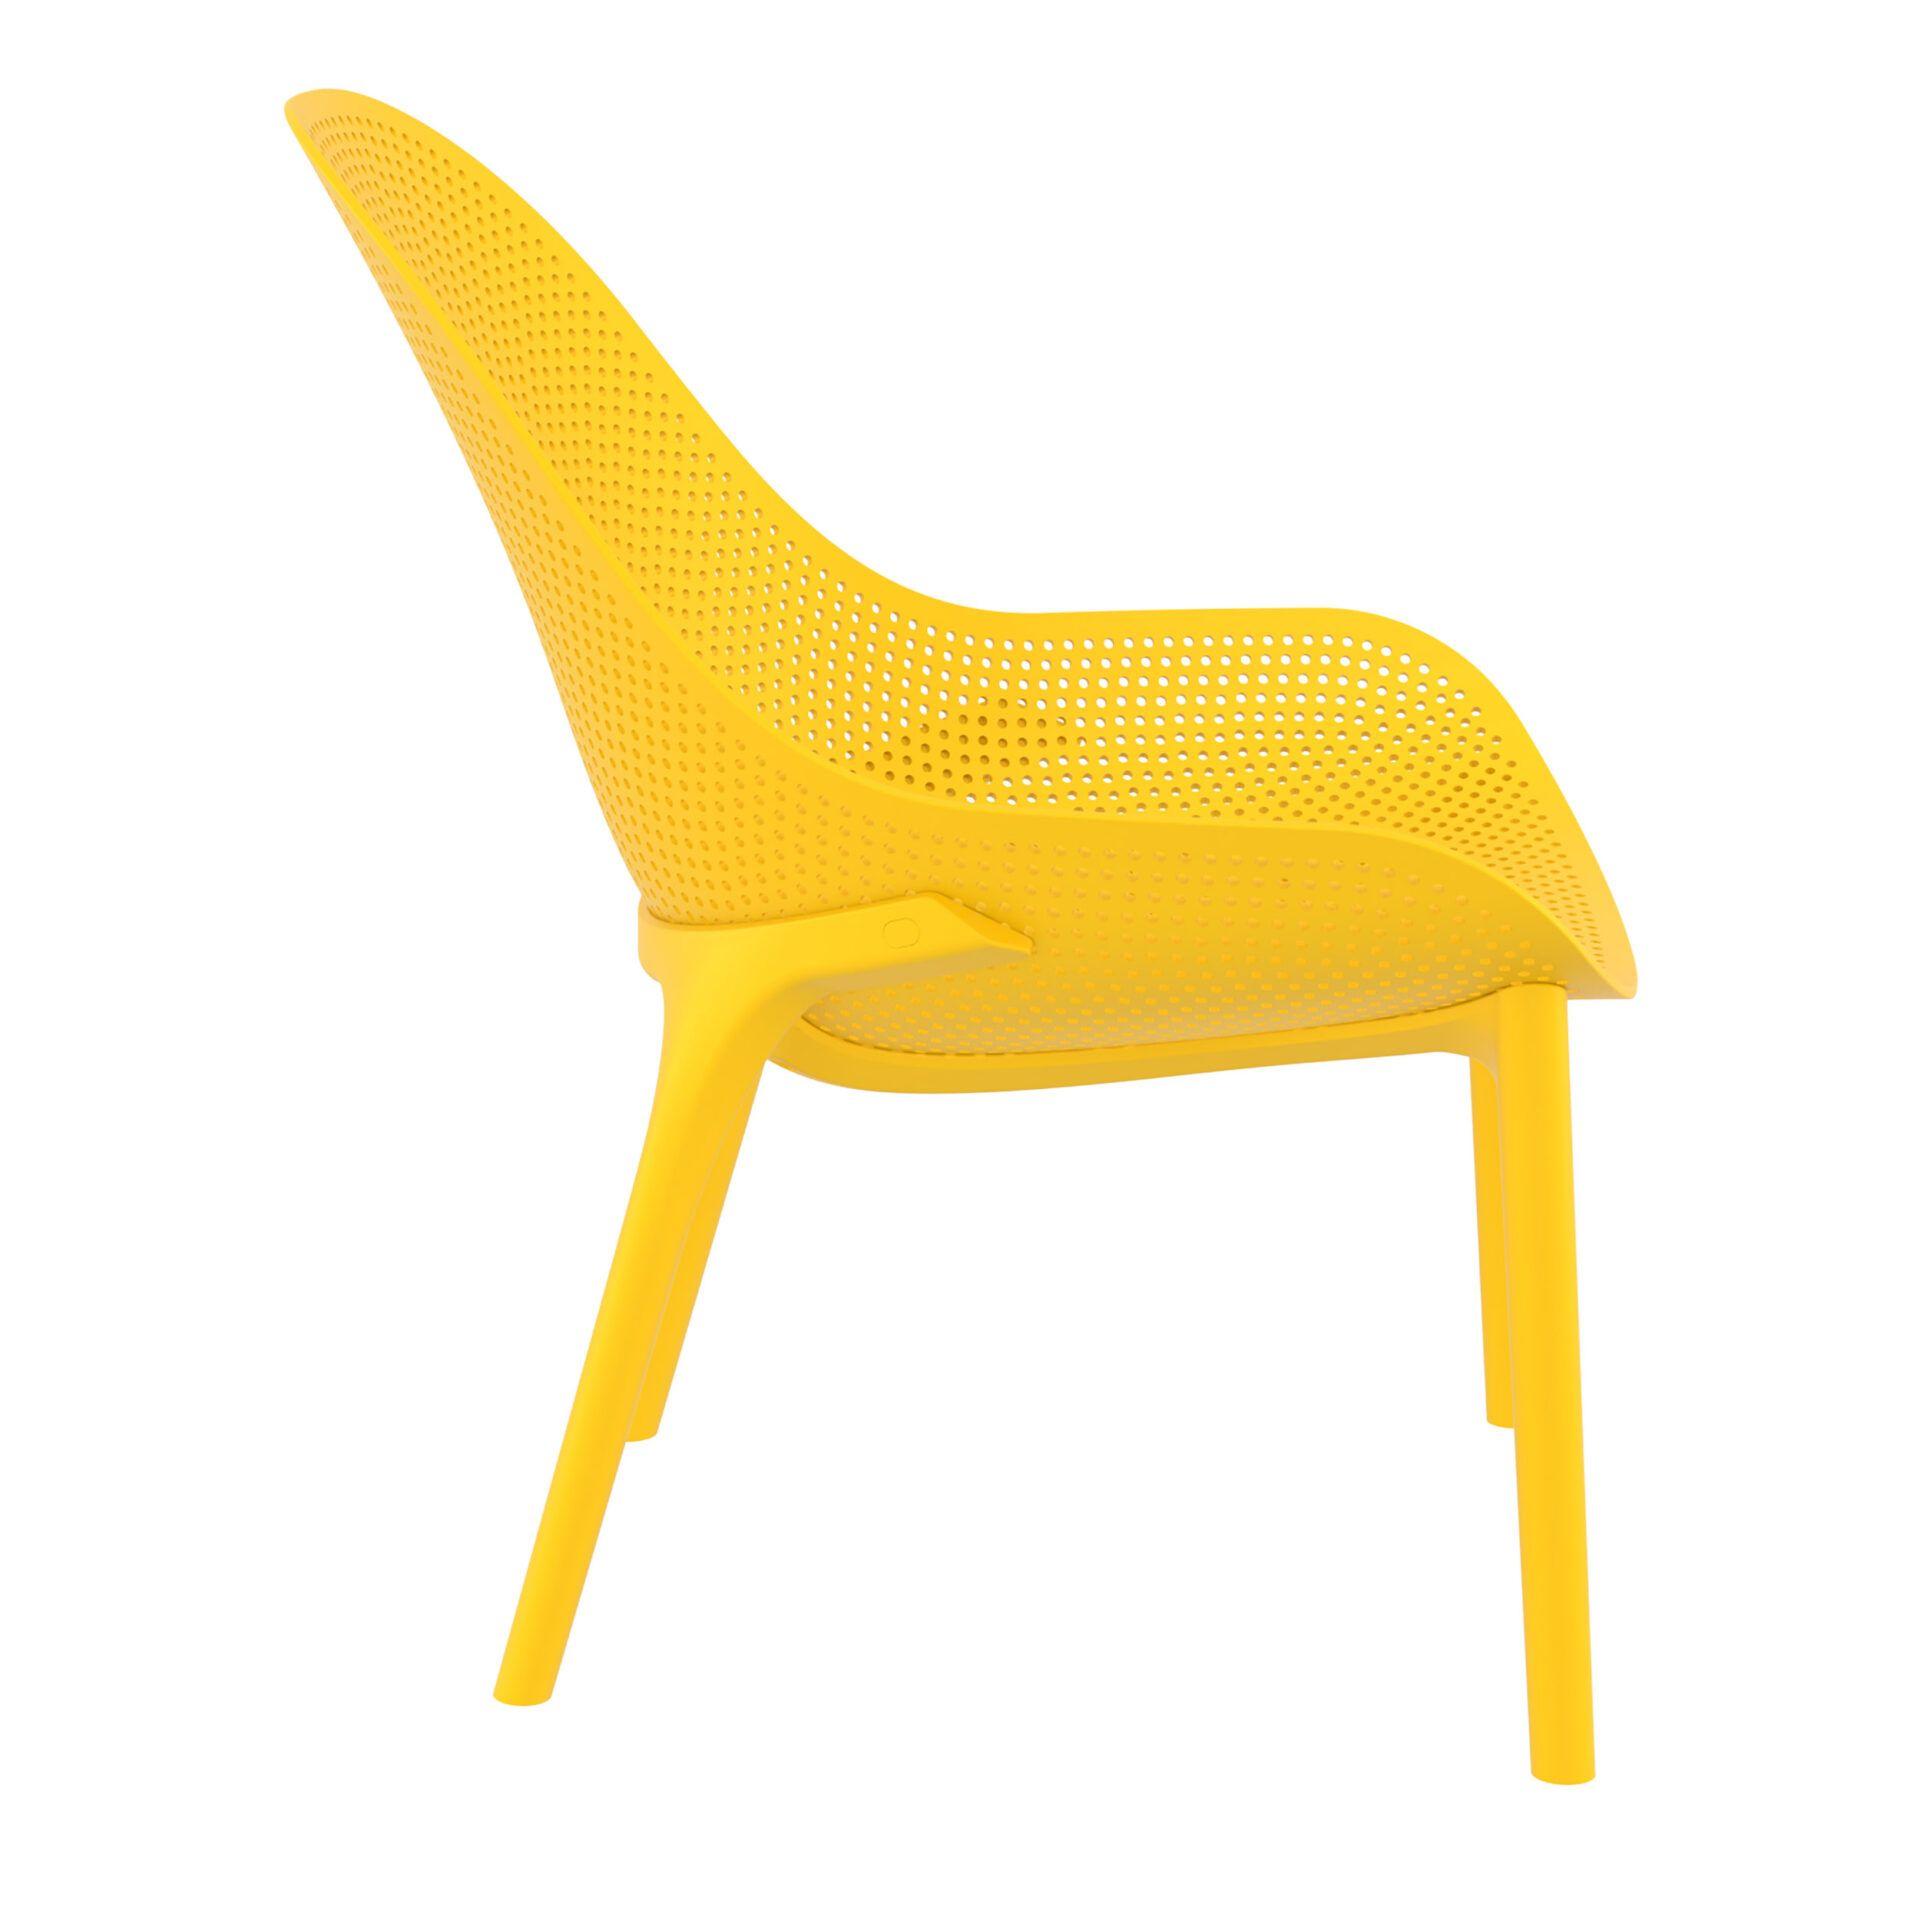 outdoor seating polypropylene sky lounge yellow side